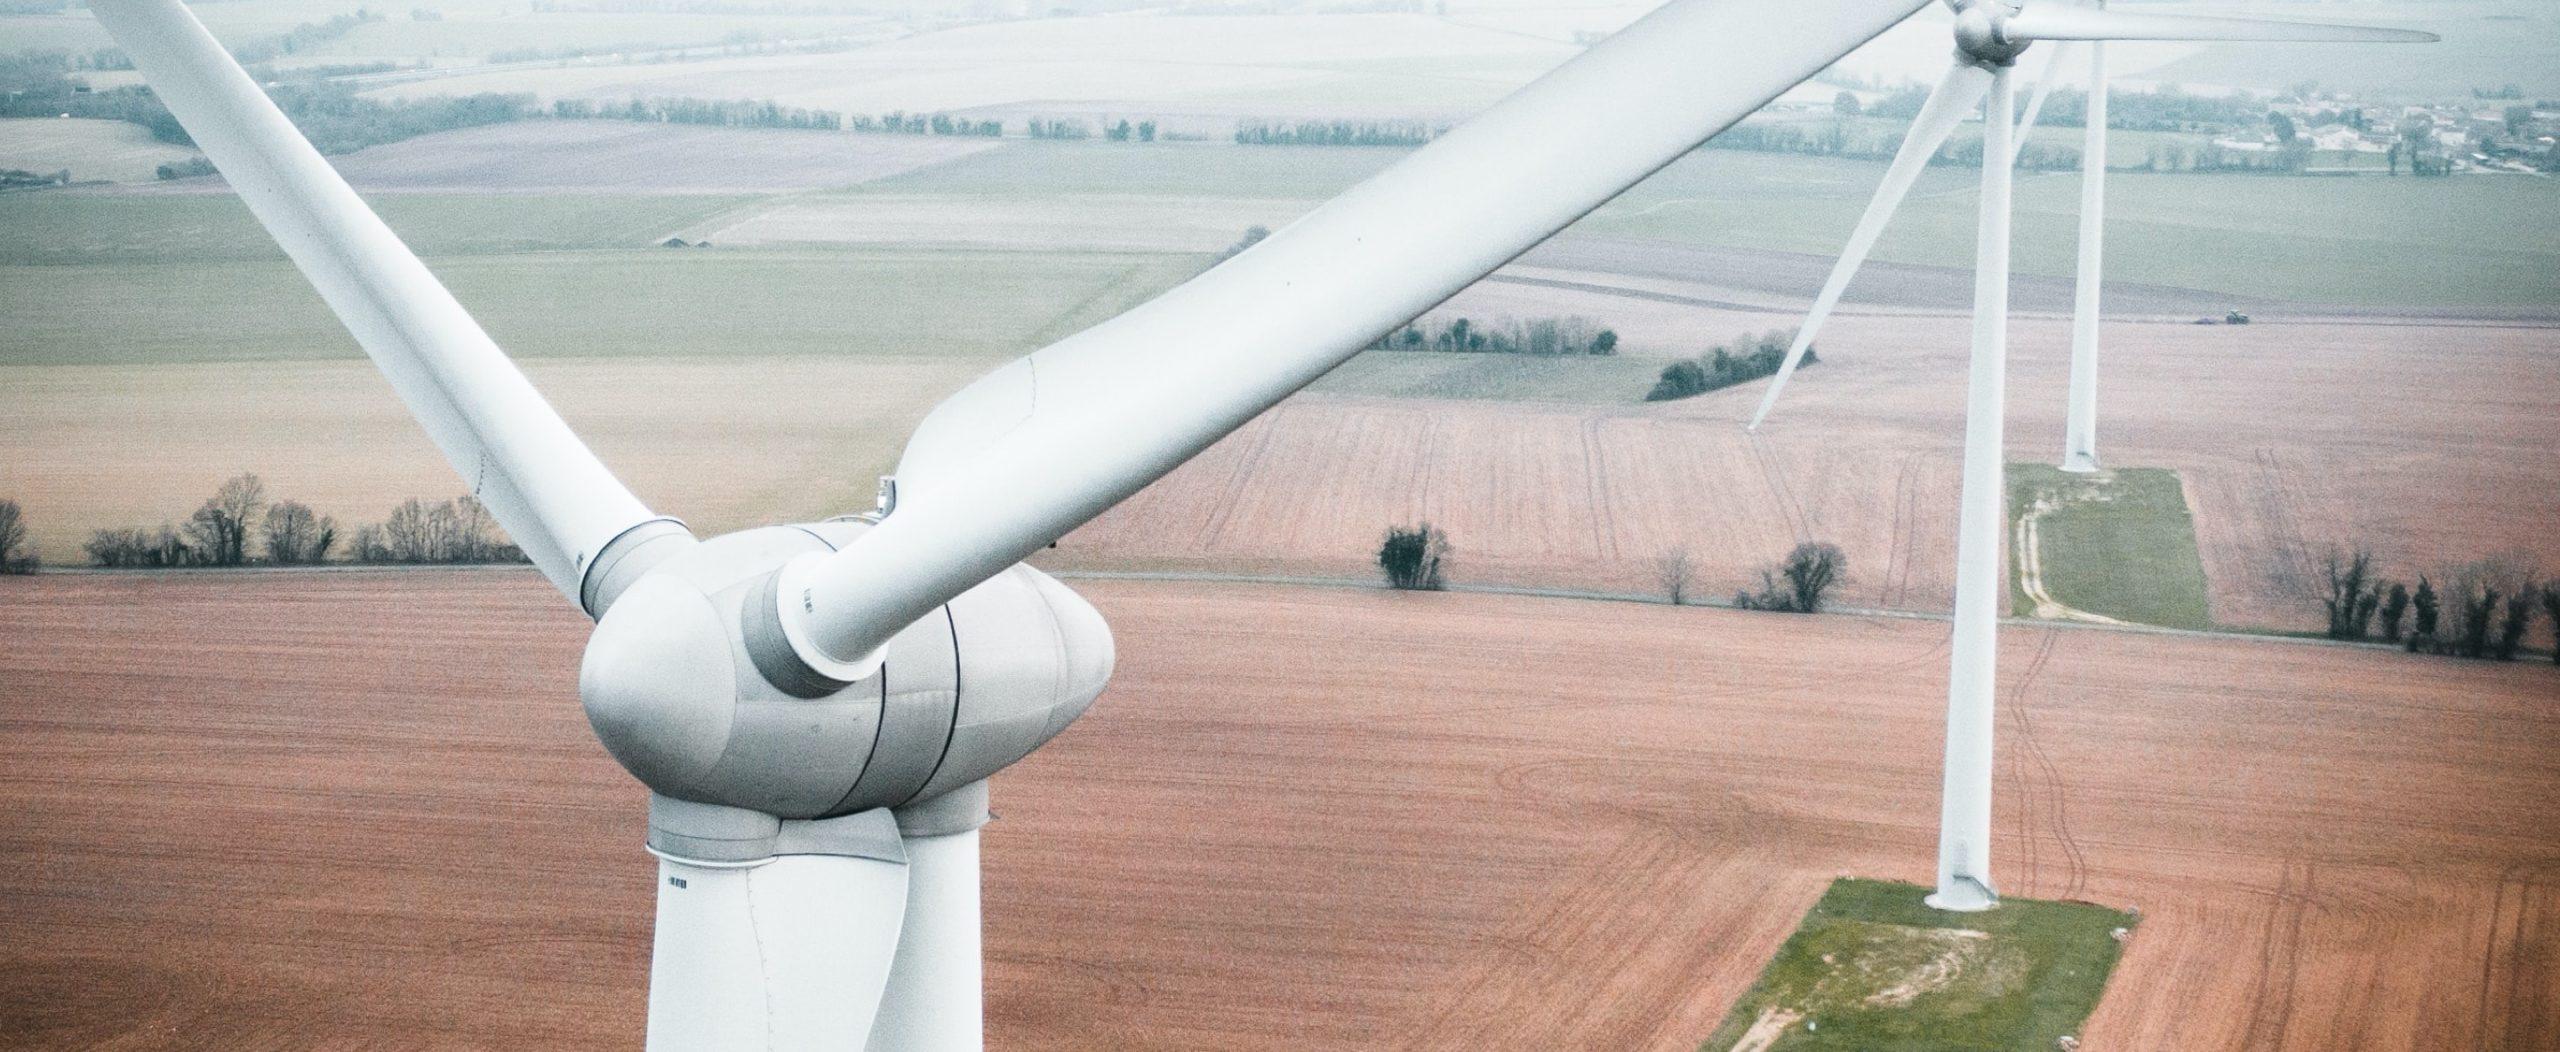 industrial wind power